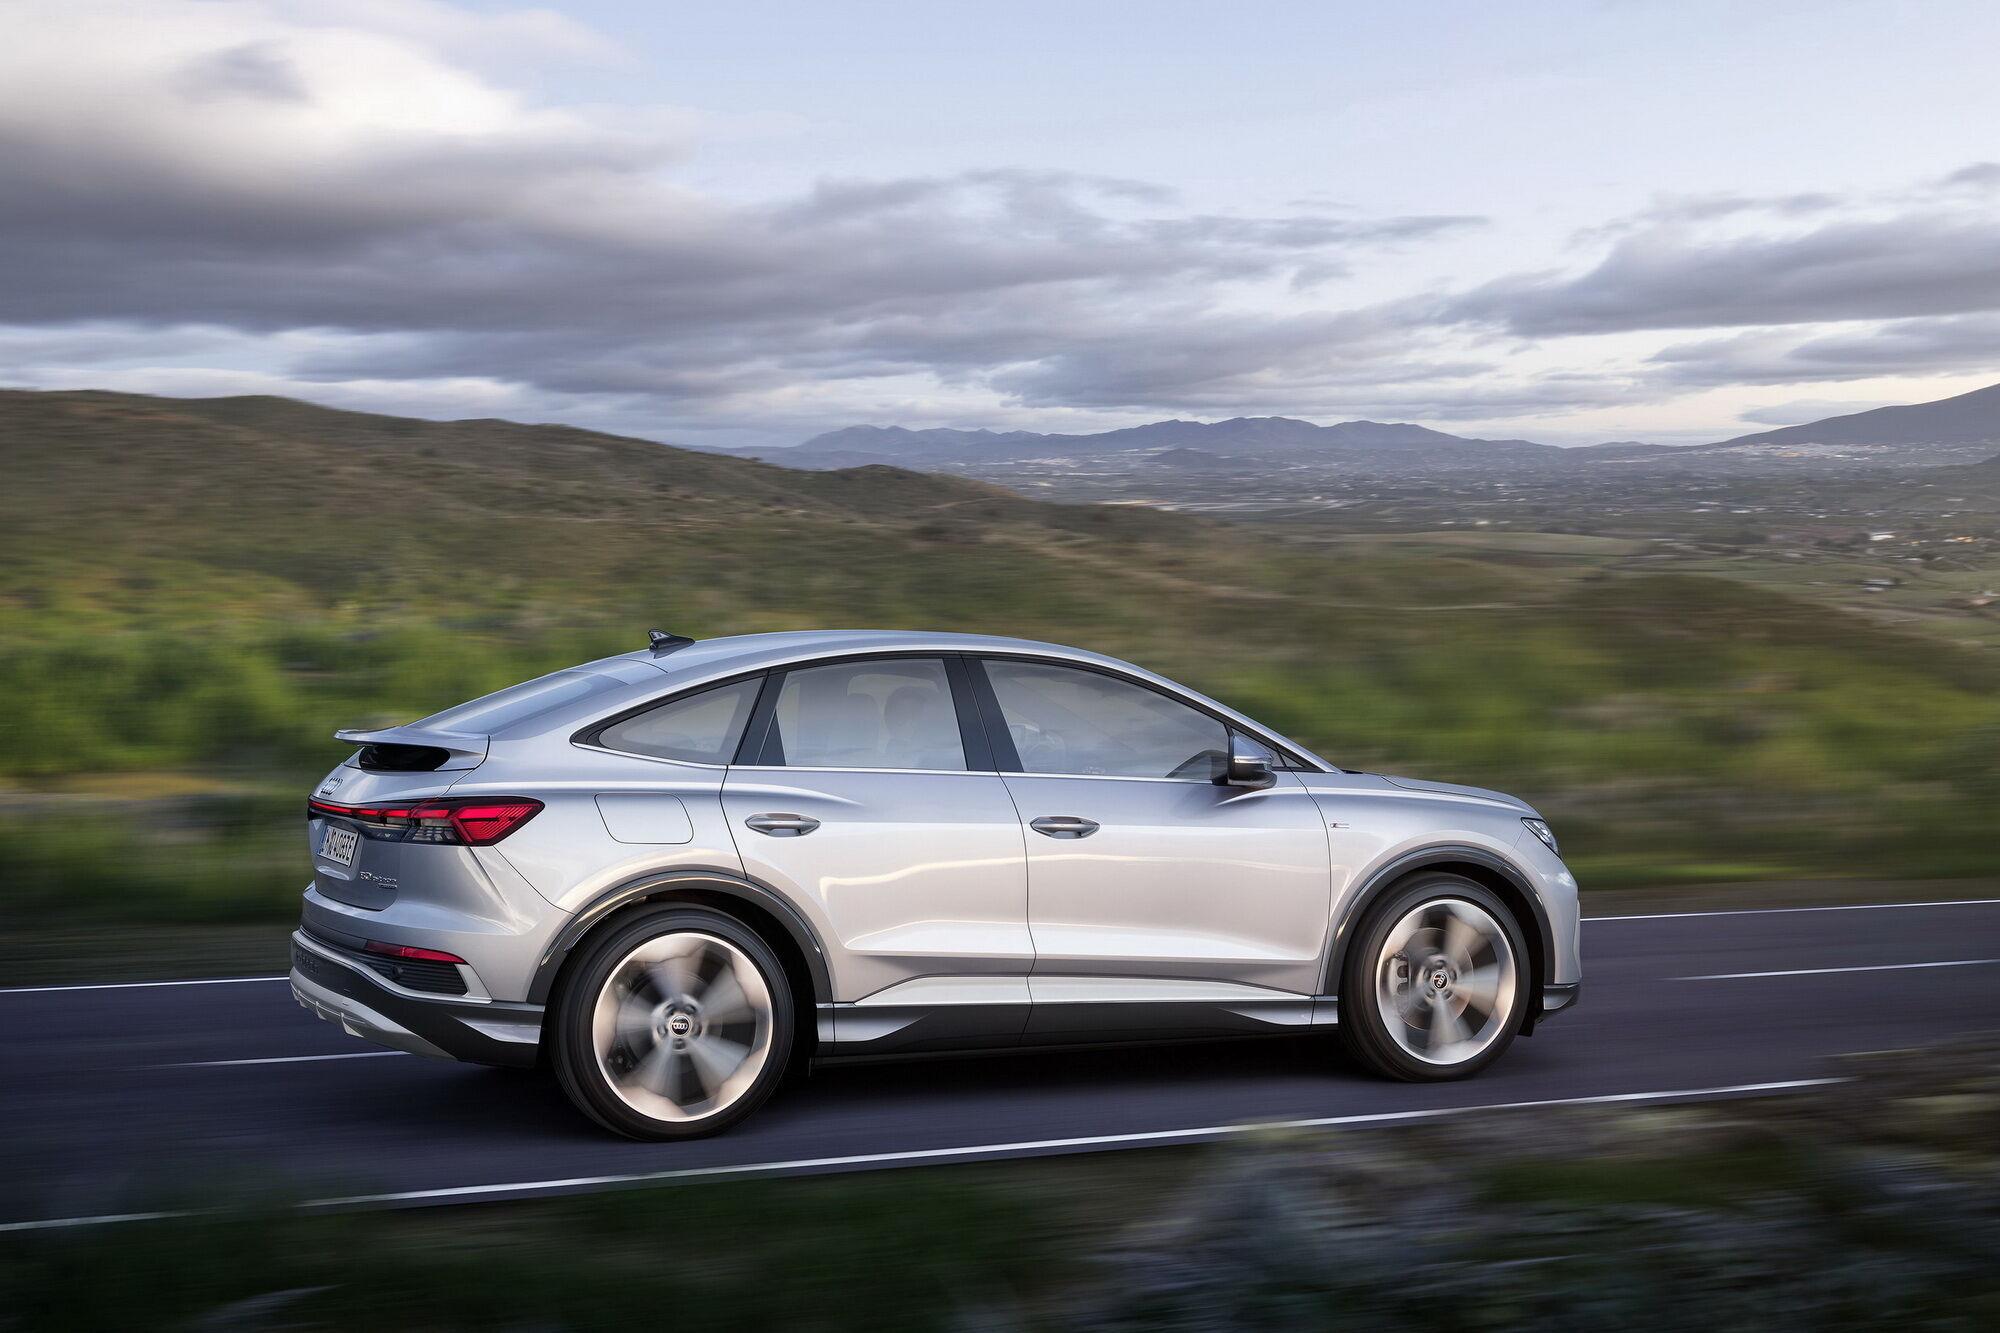 За счет более обтекаемого кузова Q4 Sportback e-tron имеет запас хода на 8-10 км больше